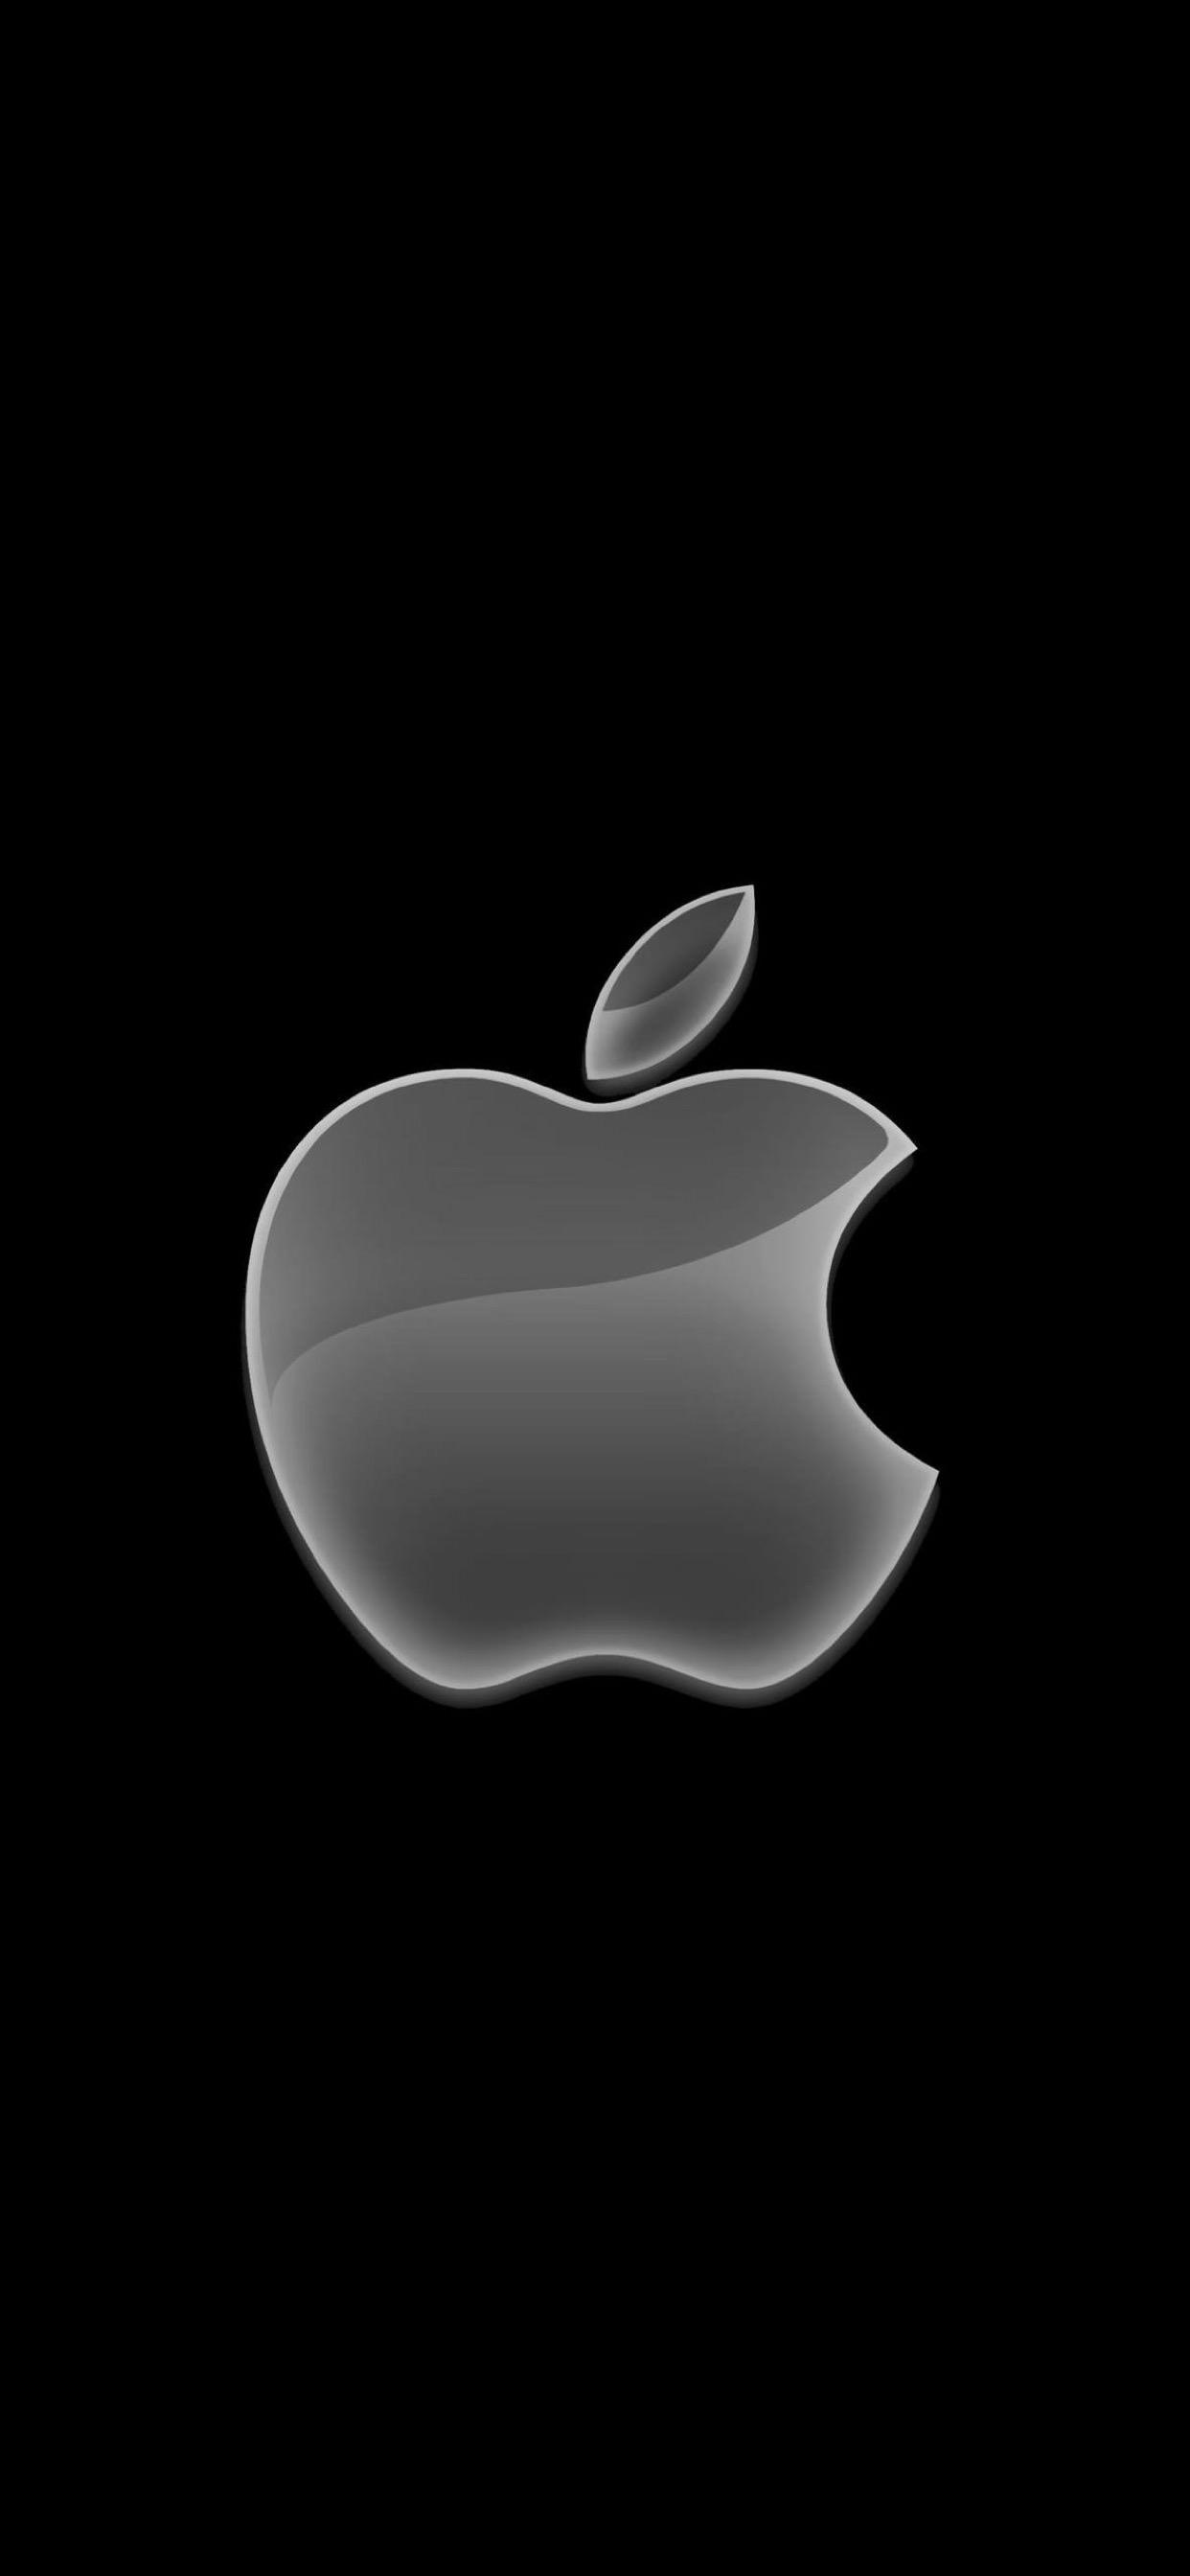 Download Iphone Xs Max Wallpaper Apple Logo